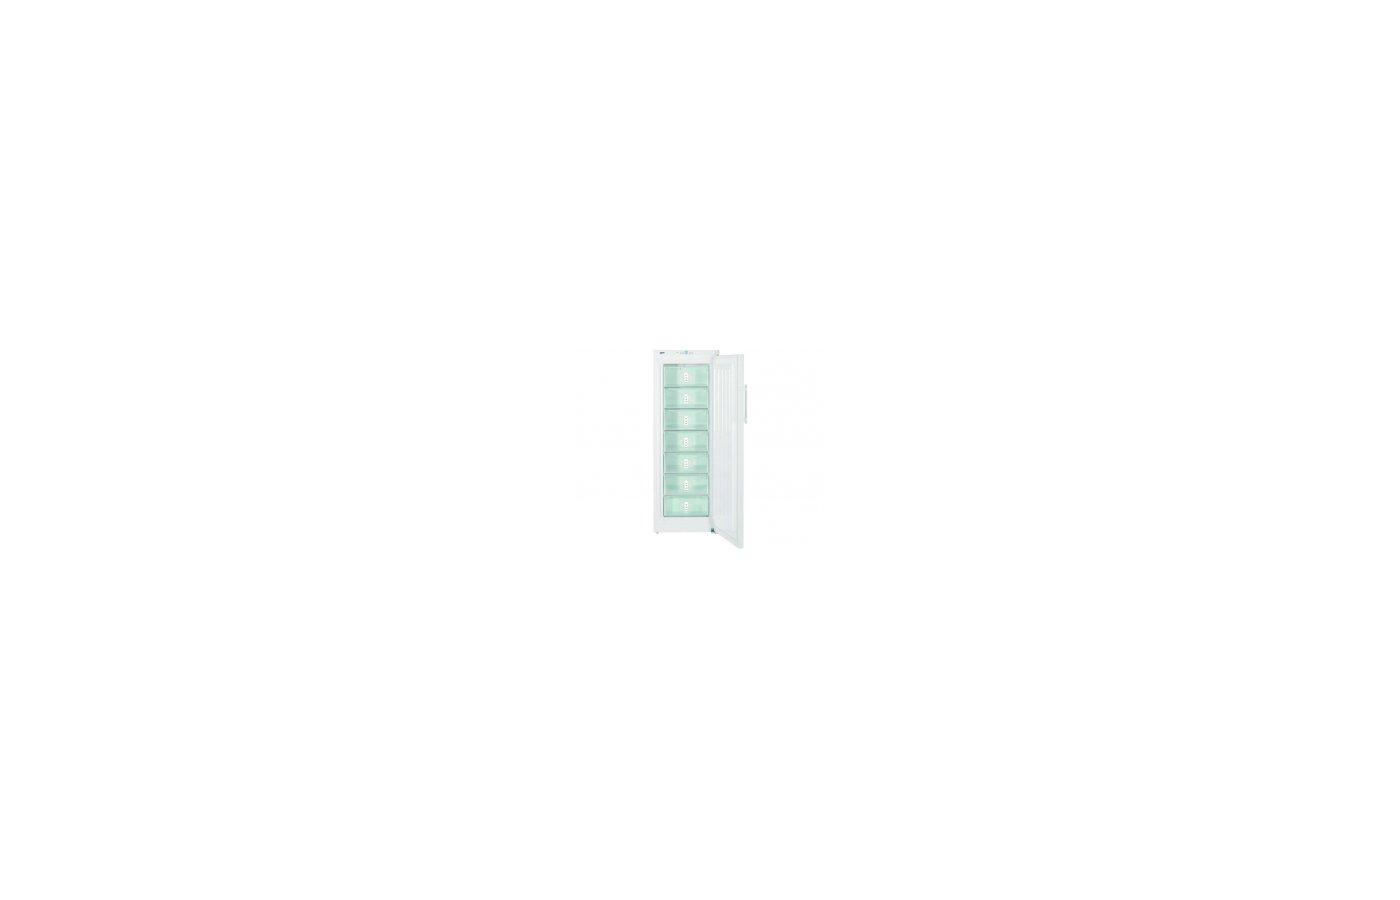 Морозильная камера вертикальная LIEBHERR GP 2733-20 001